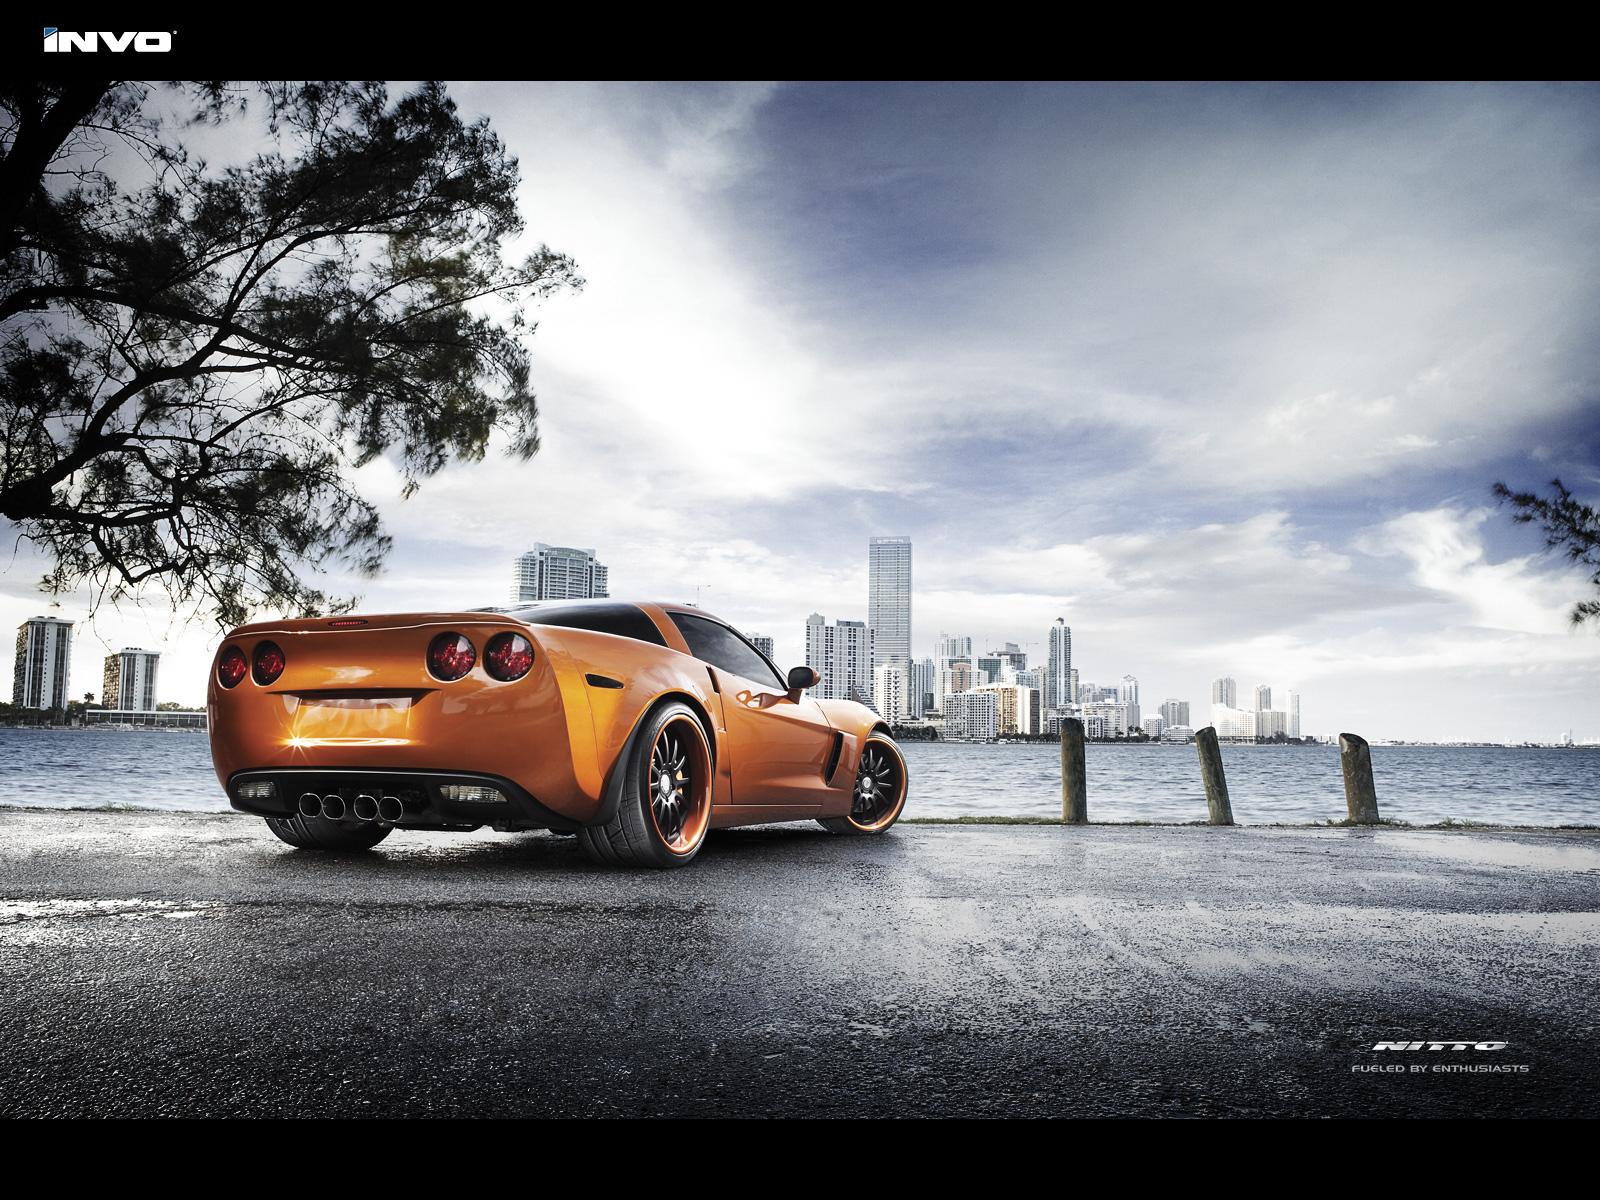 NittoWebAd Corvette 1600x1200-296946-1-